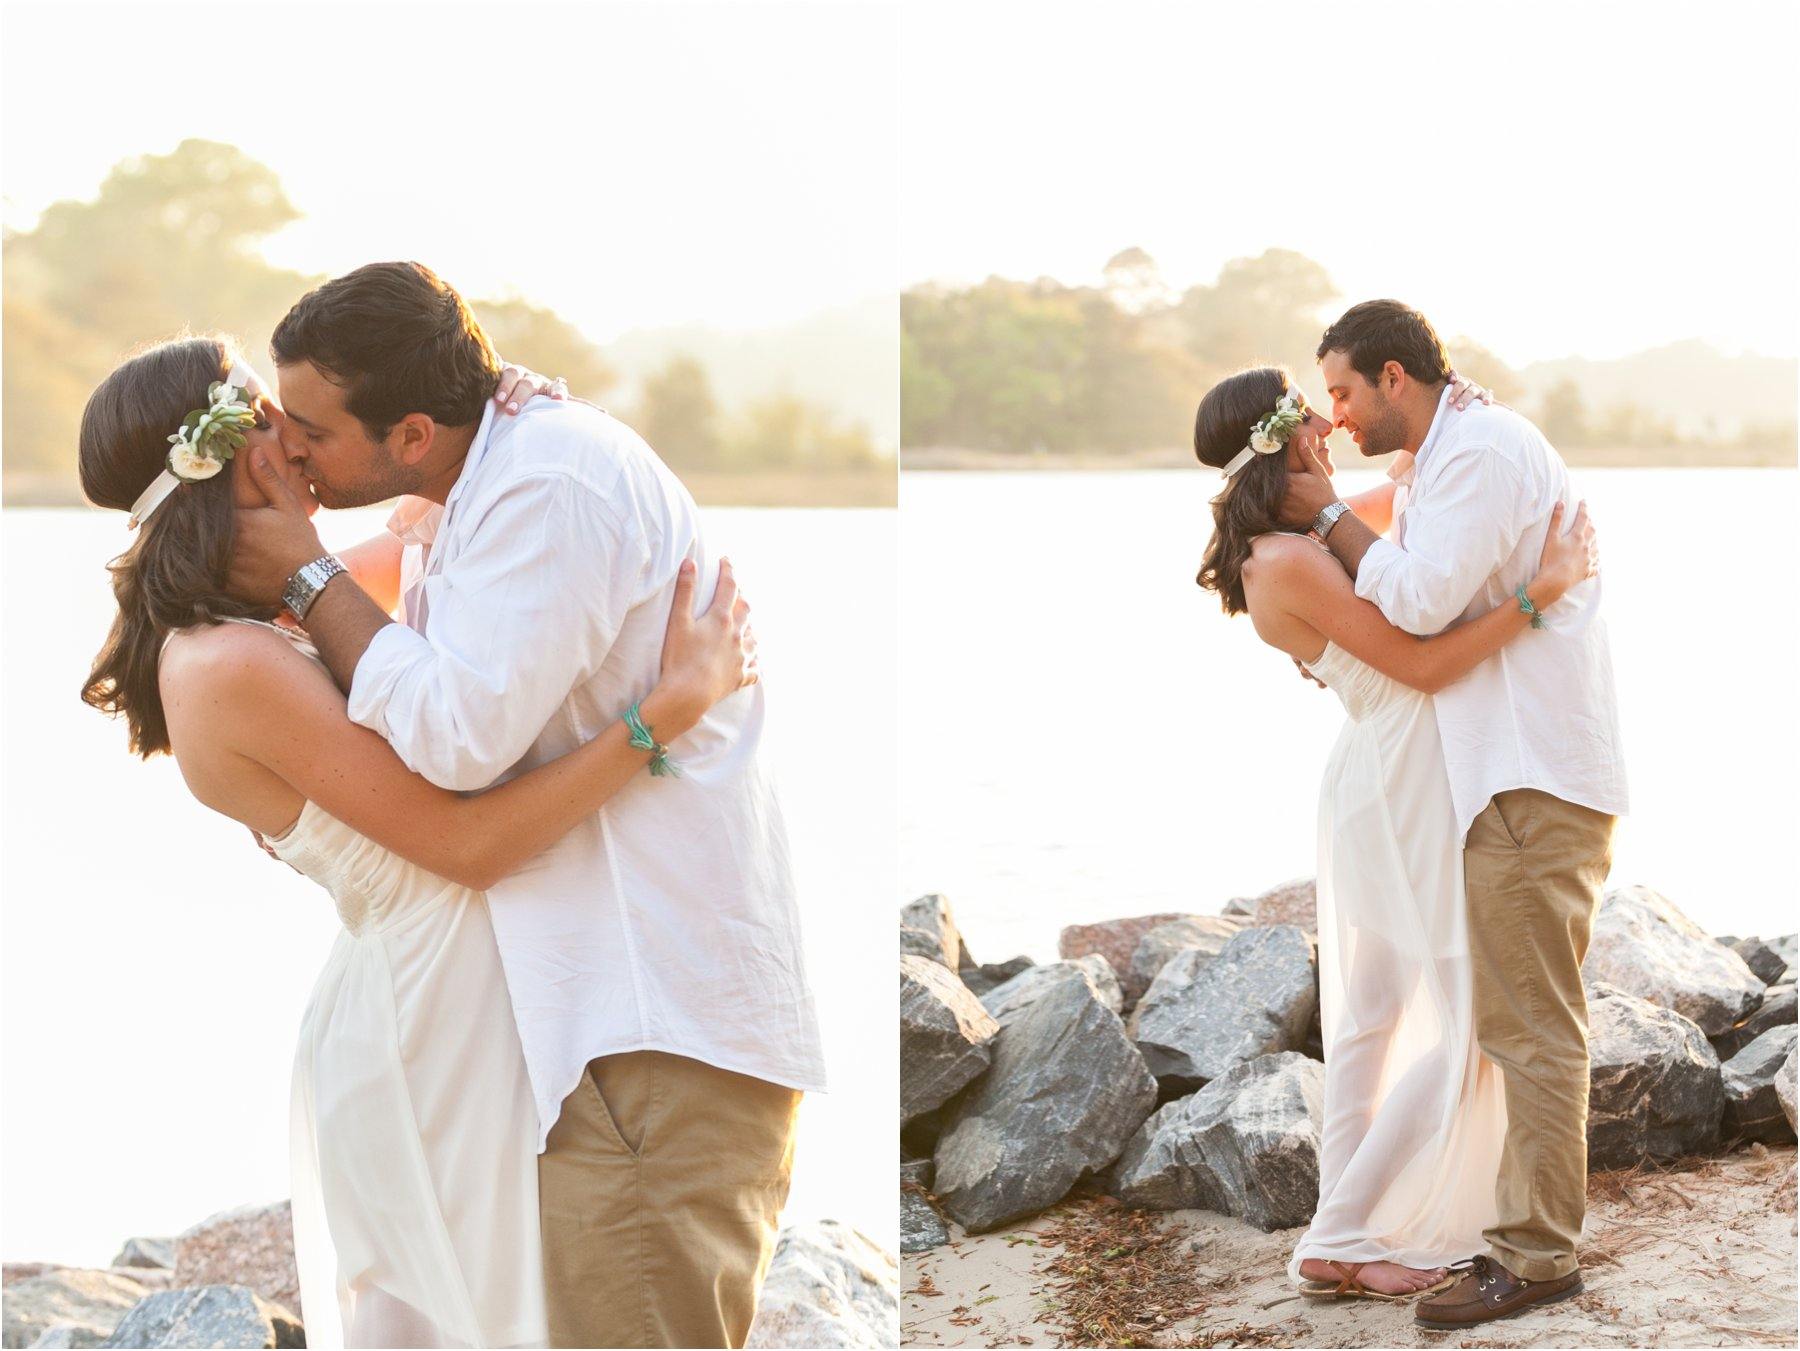 first_landing_wedding_boho_wedding_photography_virginia_Jessica_ryan_photography_0210